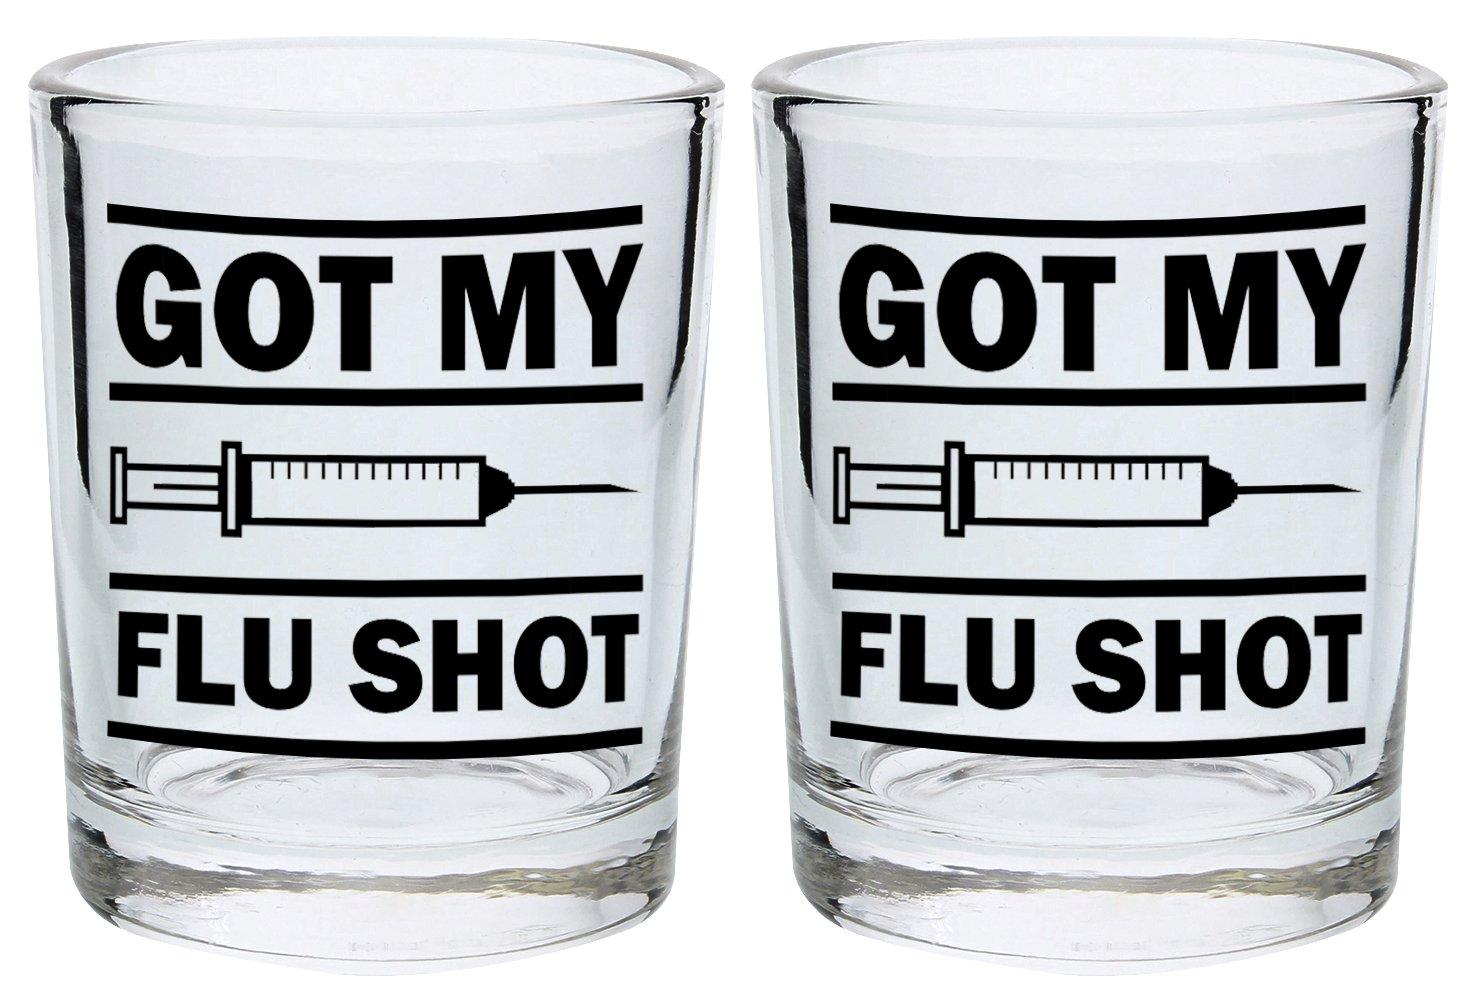 Funny Shot Glasses for College Got My Flu Shot Drinking Games Shot Glass Gift Shot Glasses 2-Pack Round Shot Glass Set Black